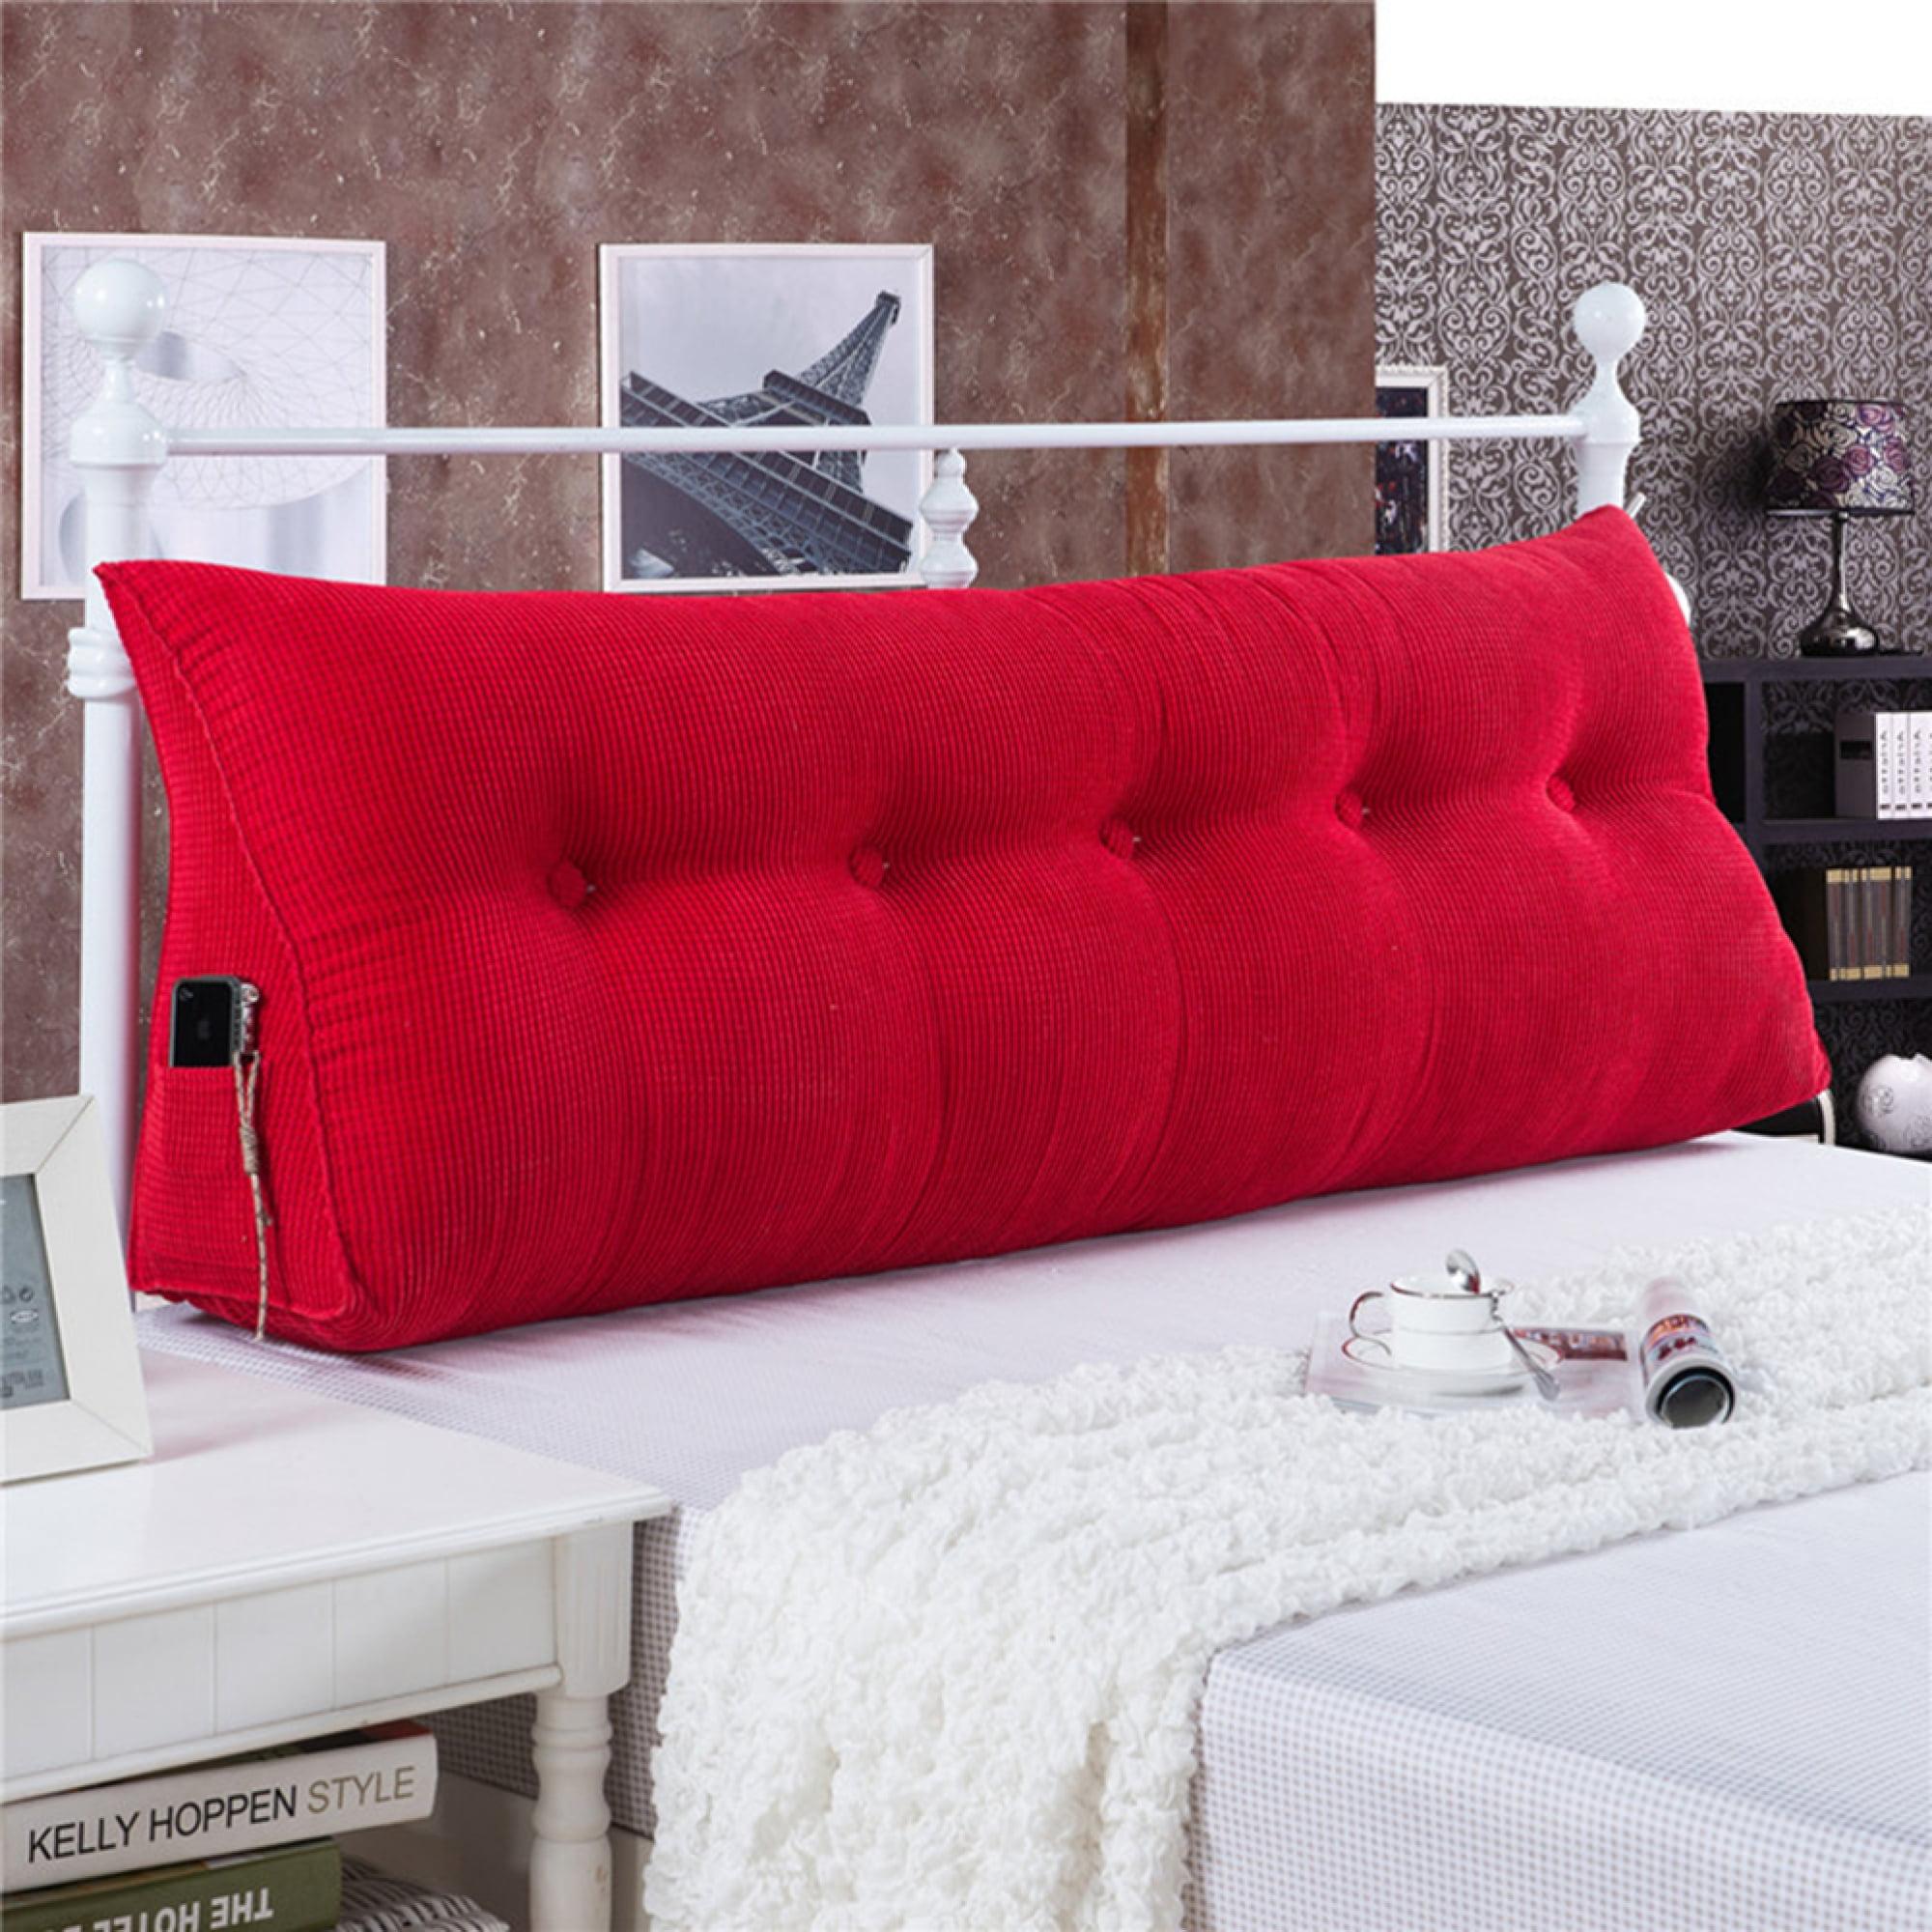 Sofa Bed Large Filled Triangular Wedge Cushion Bed Backrest